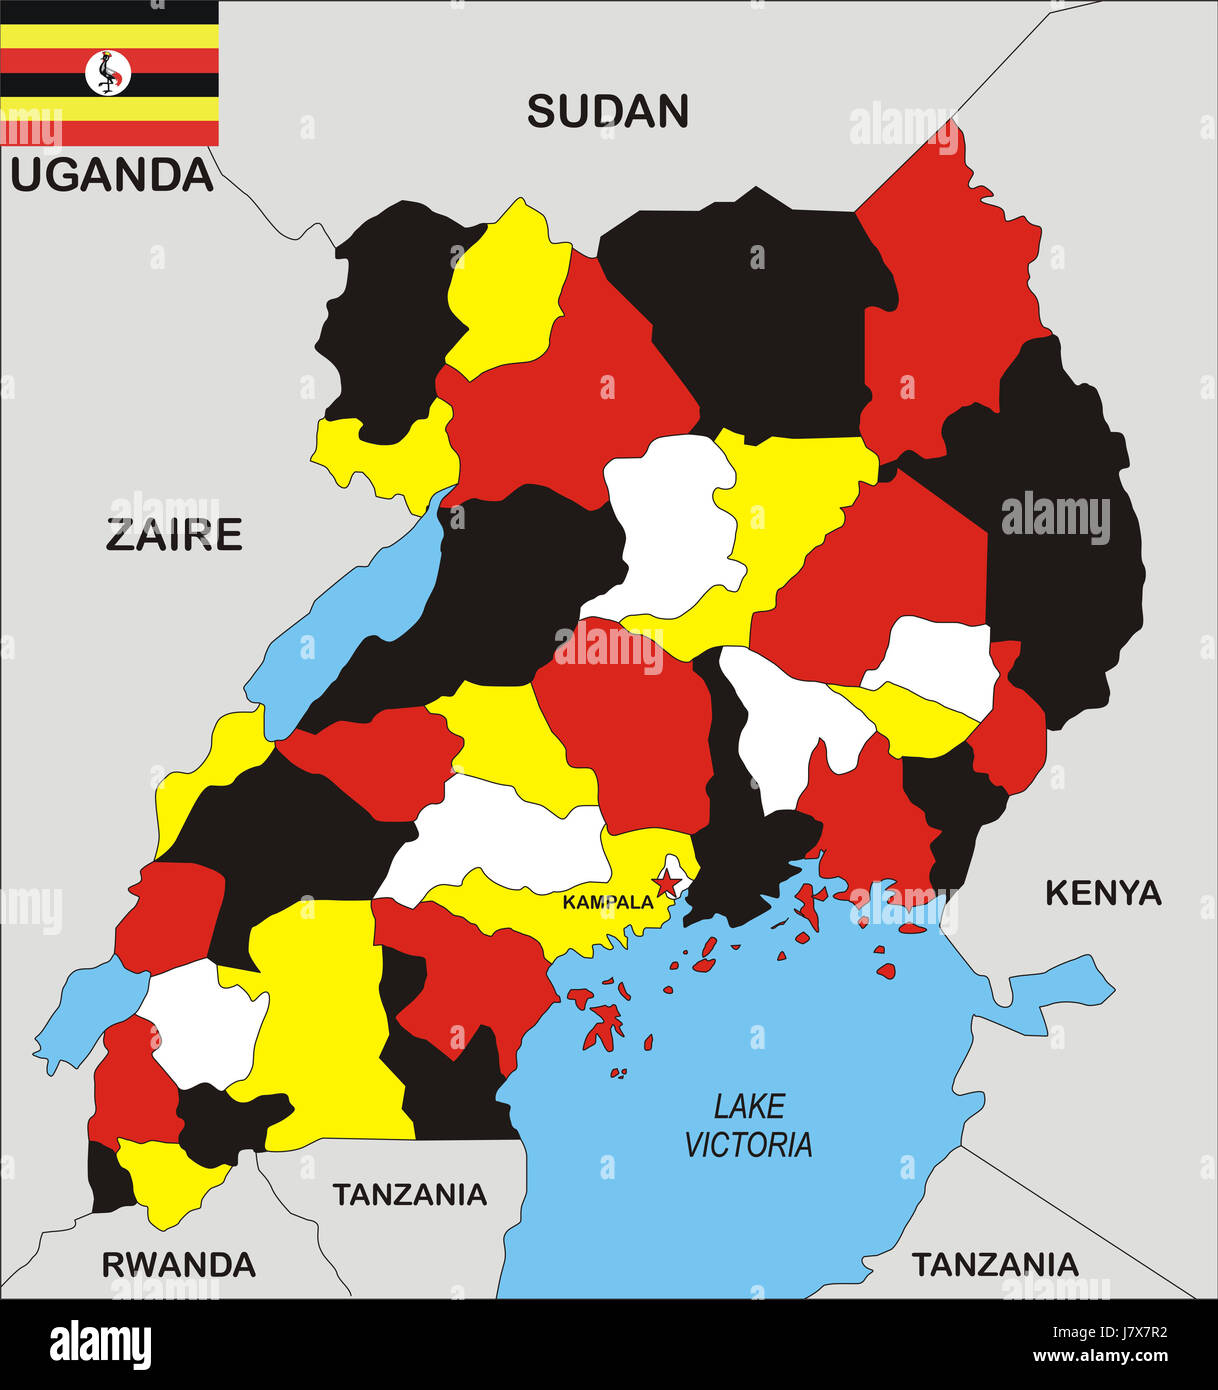 Uganda map atlas map of the world political flag country state uganda map atlas map of the world political flag country state territory uganda gumiabroncs Images